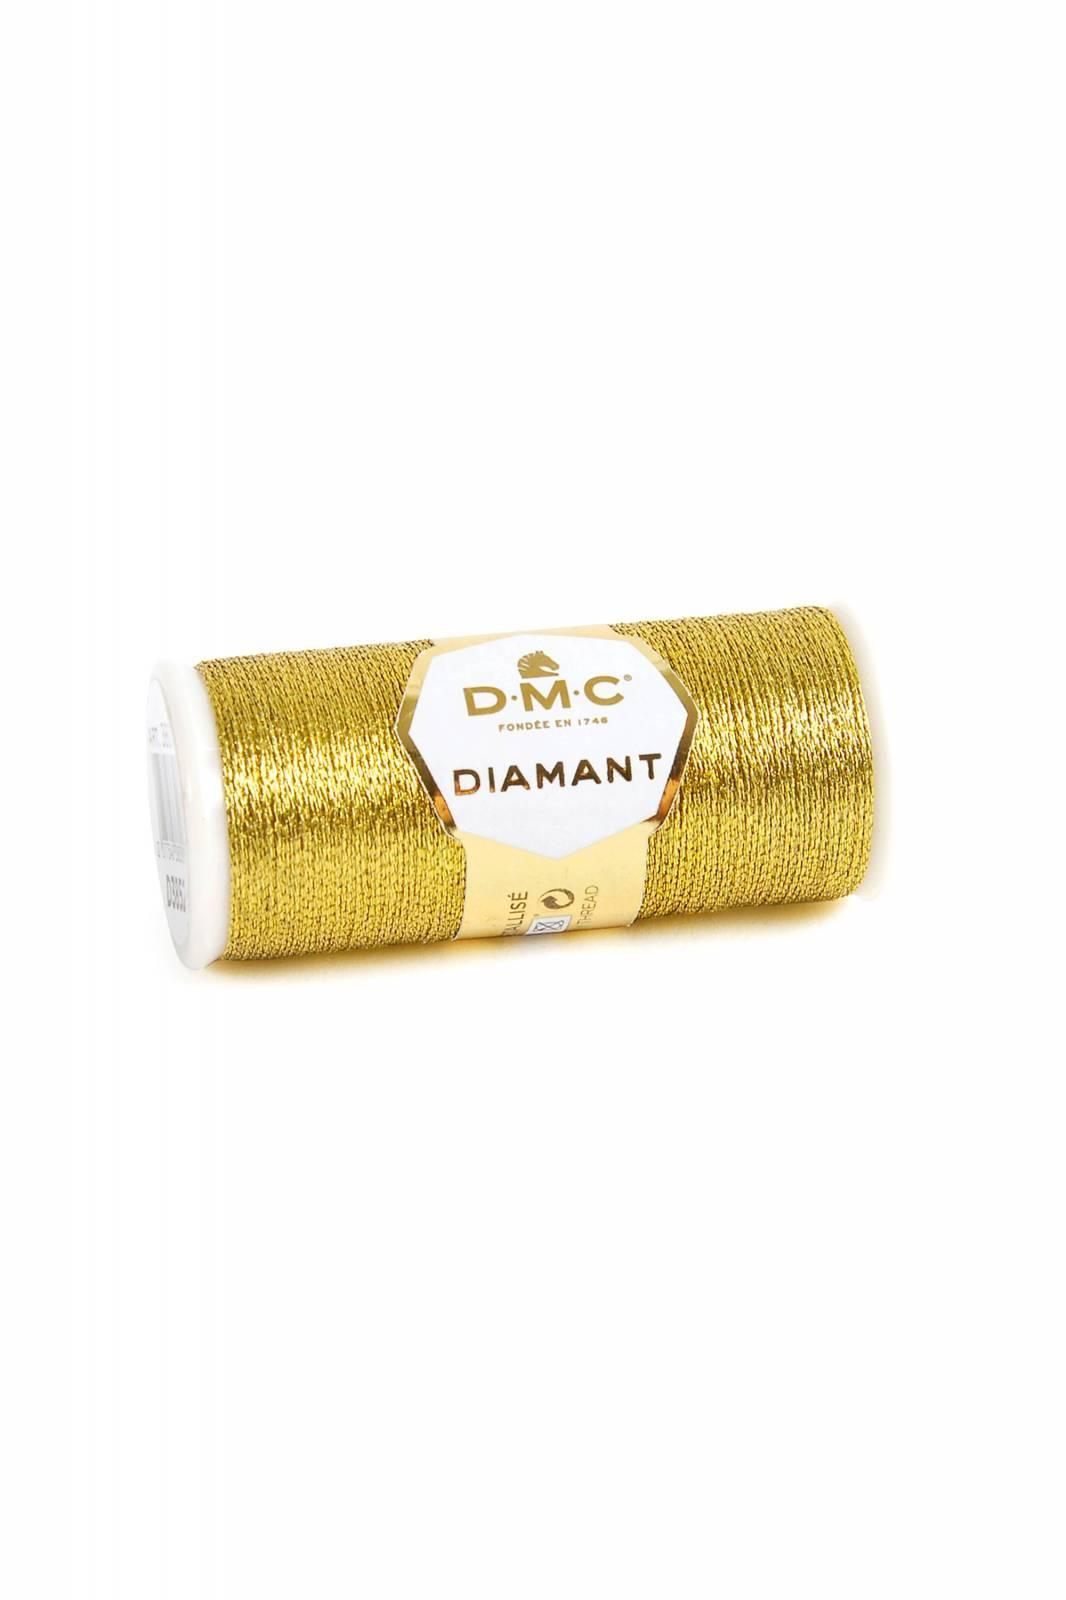 Diamant cor 3852 - BAÚ DA VOVÓ